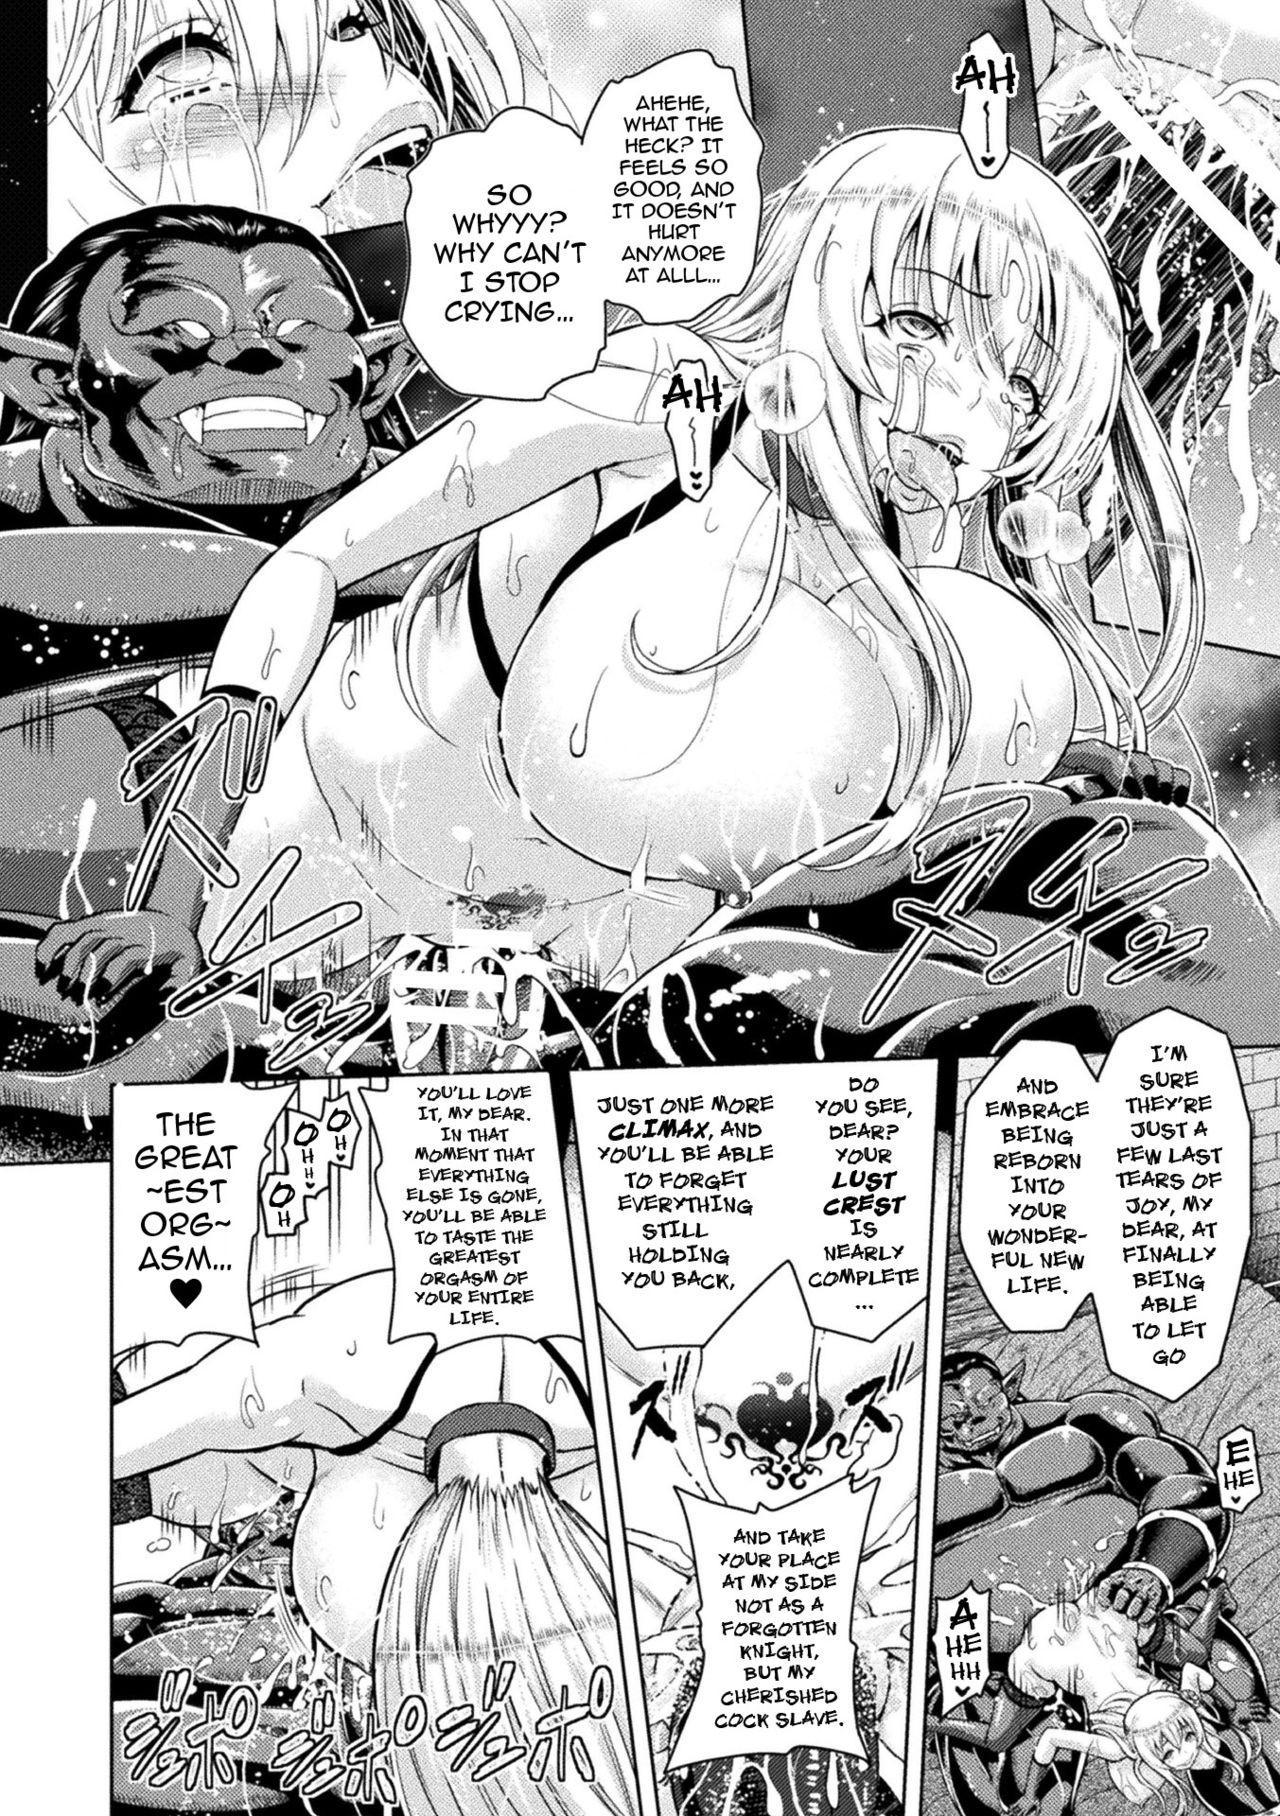 [Yamada Gogogo] Erona ~Orc no Inmon ni Okasareta Onna Kishi no Matsuro~   Erona ~The Fall of a Beautiful Knight Cursed with the Lewd Mark of an Orc~ Ch. 1-6 [English] {darknight} 70